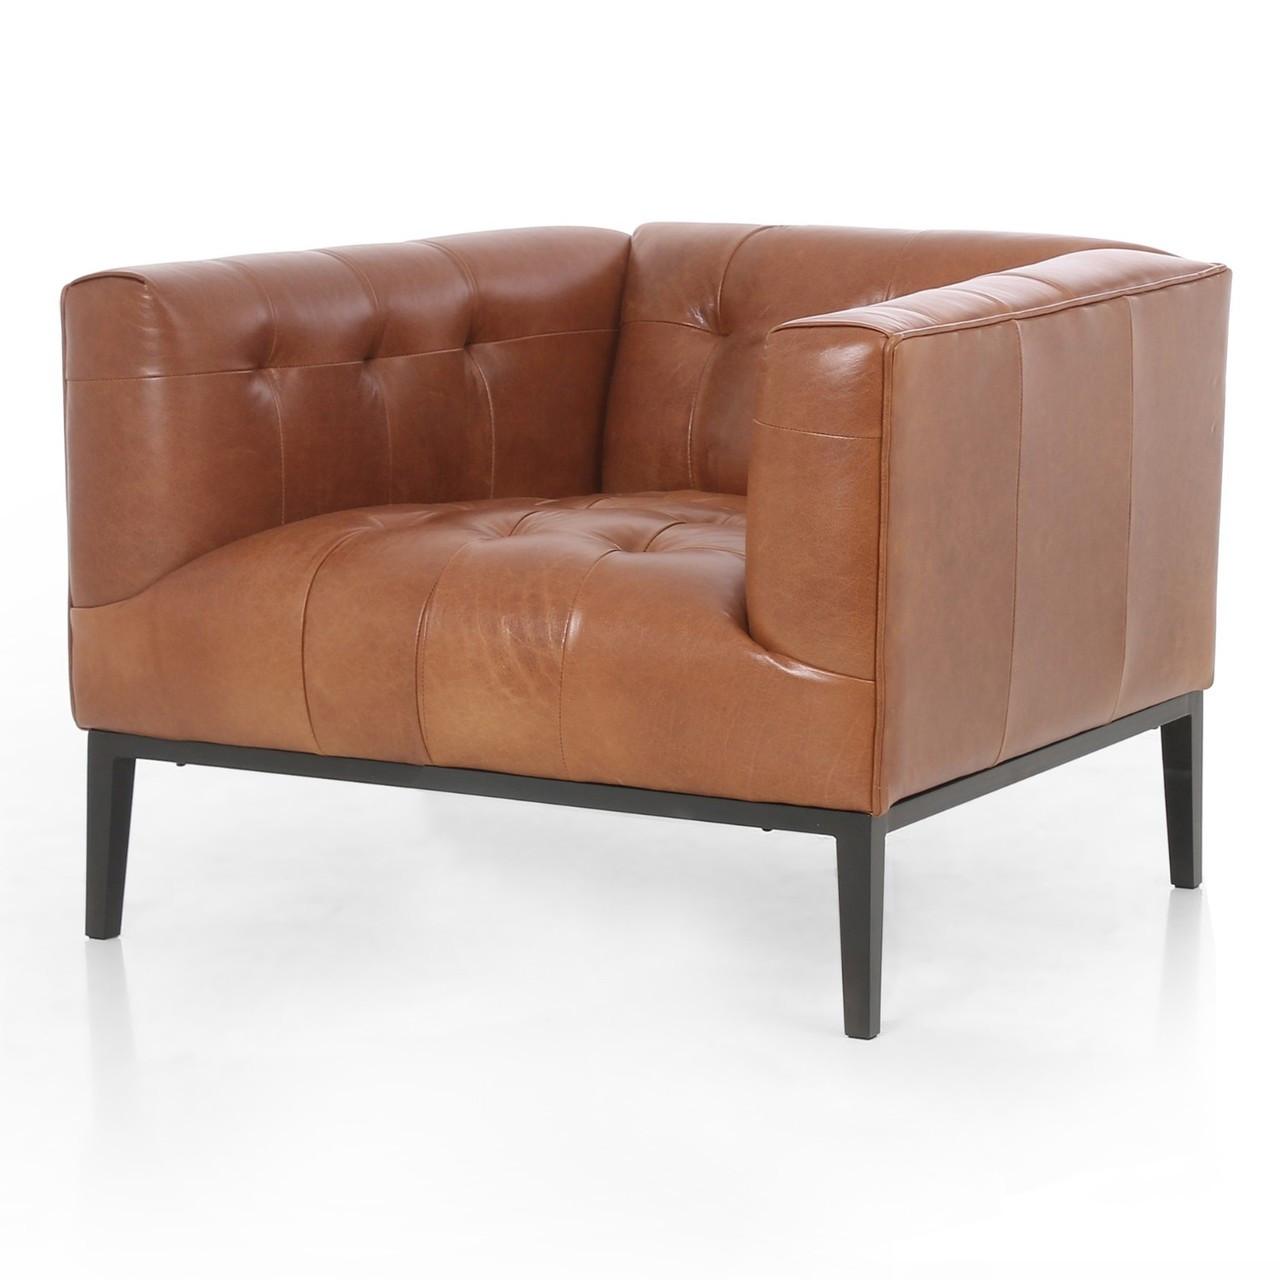 Marlin Modern Sycamore Tan Leather Tufted Club Chair